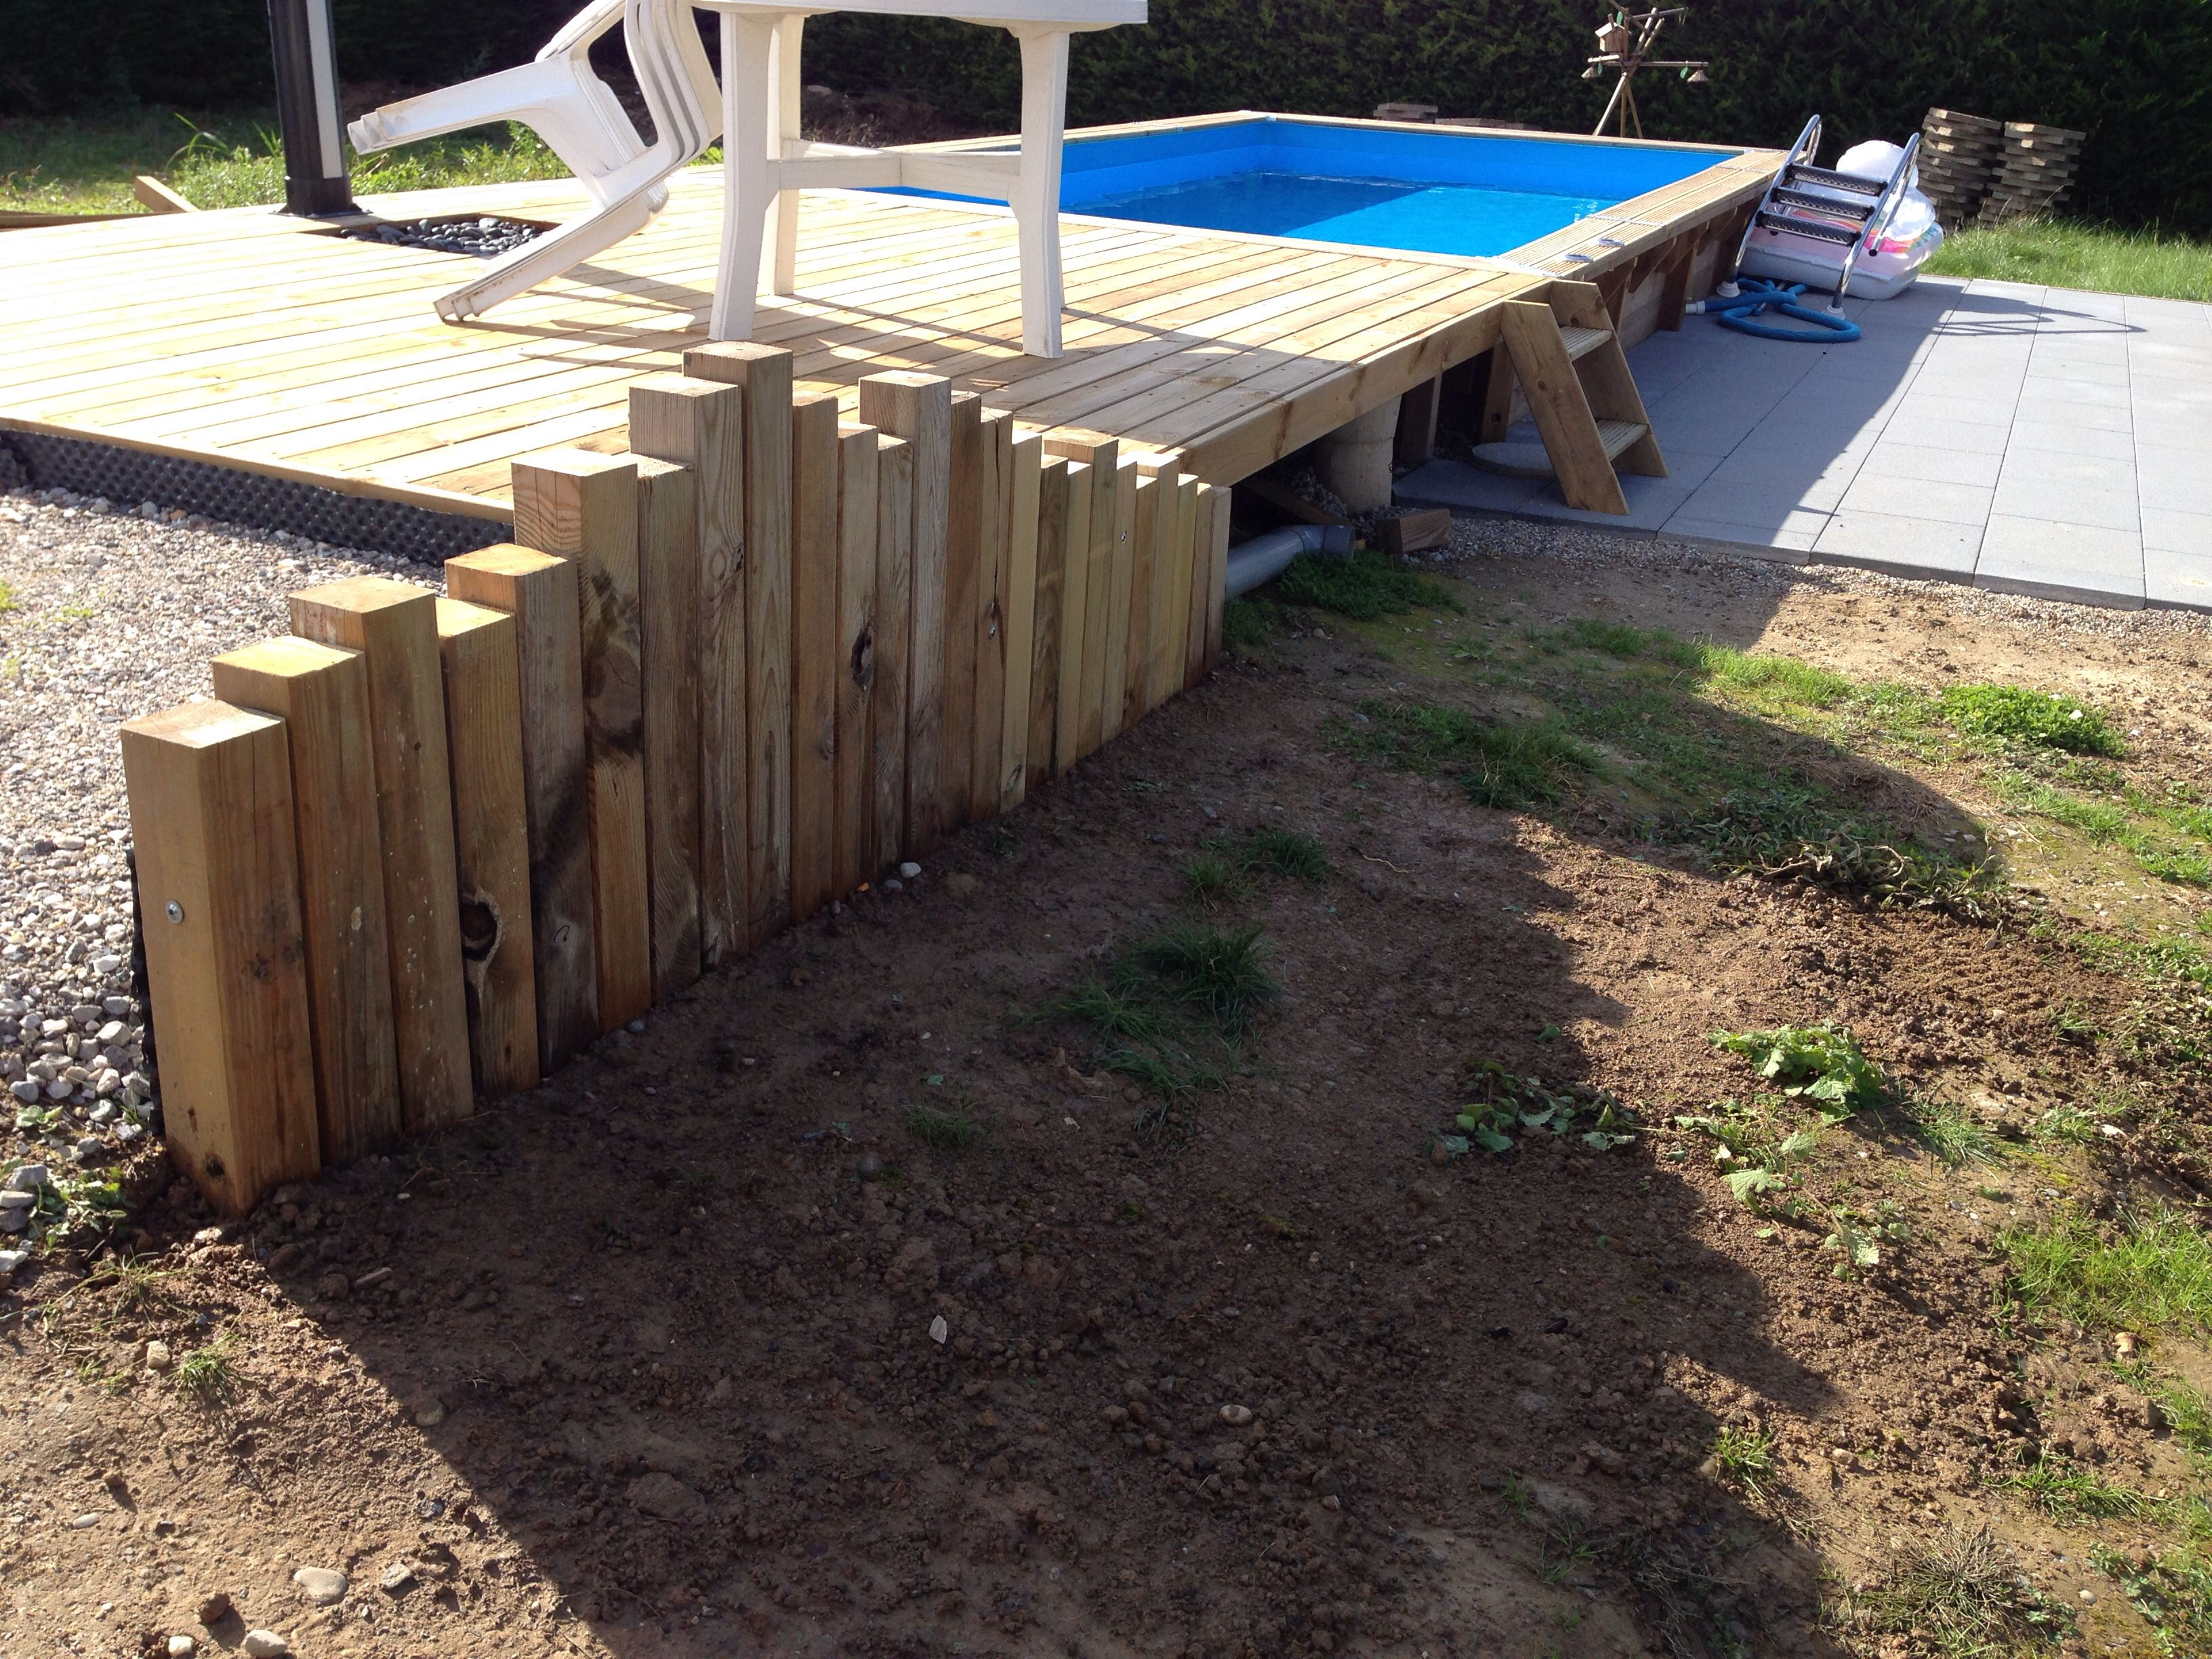 retenue de terre abris jardin construction terrasse bois construction terrasse et terrasse bois. Black Bedroom Furniture Sets. Home Design Ideas